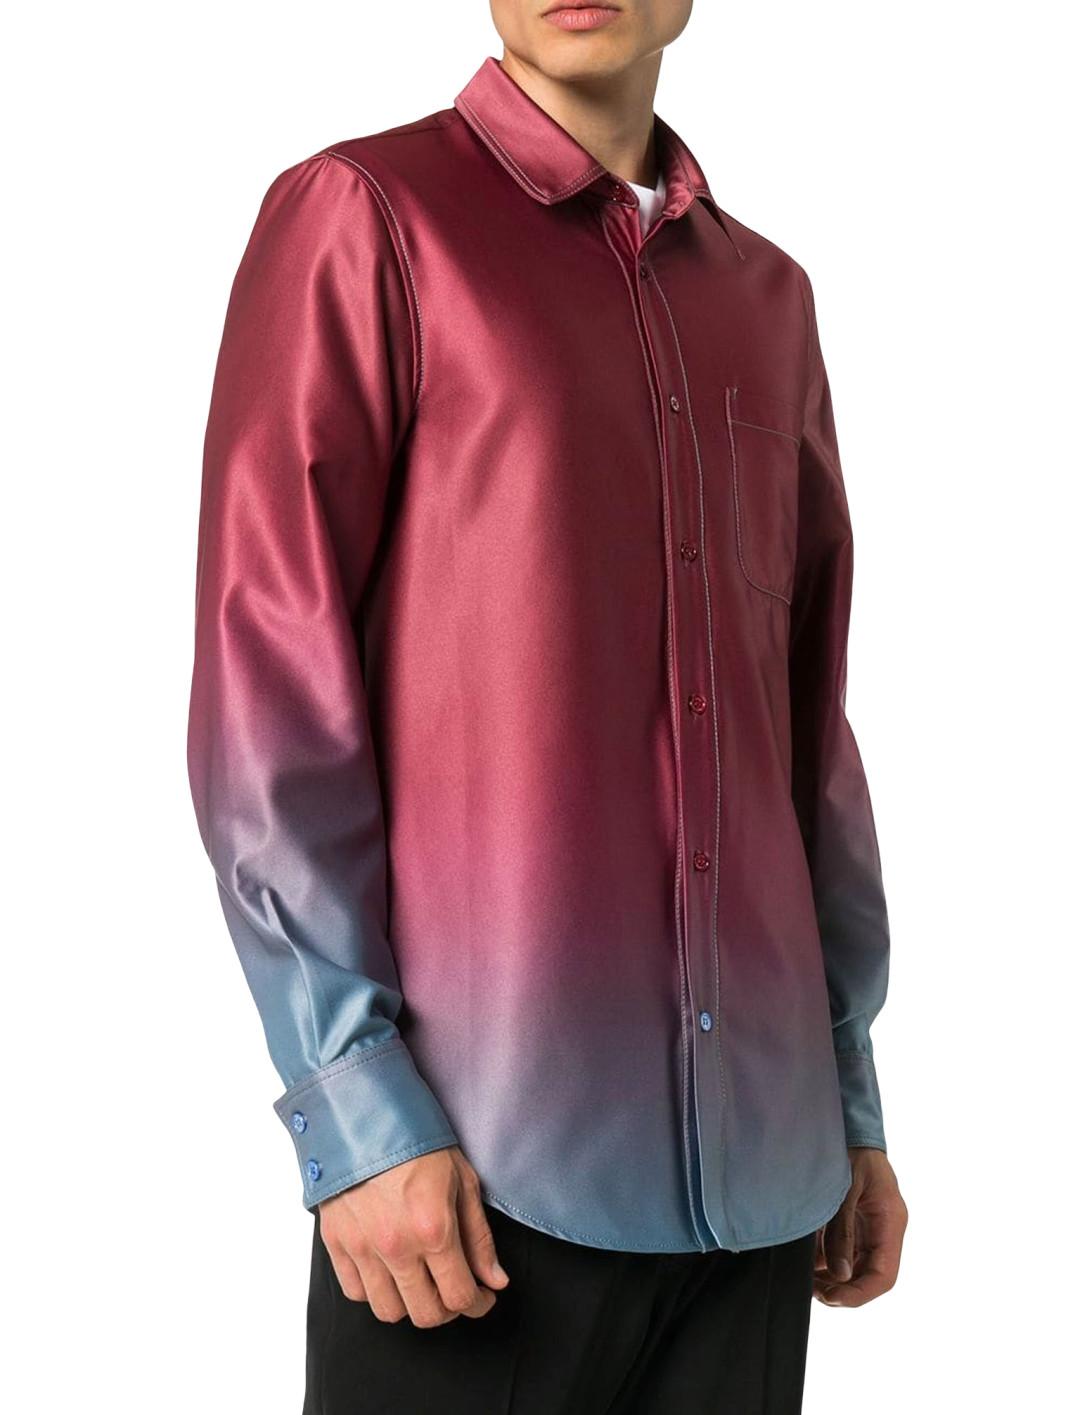 Sander Gradient Shirt Clothing